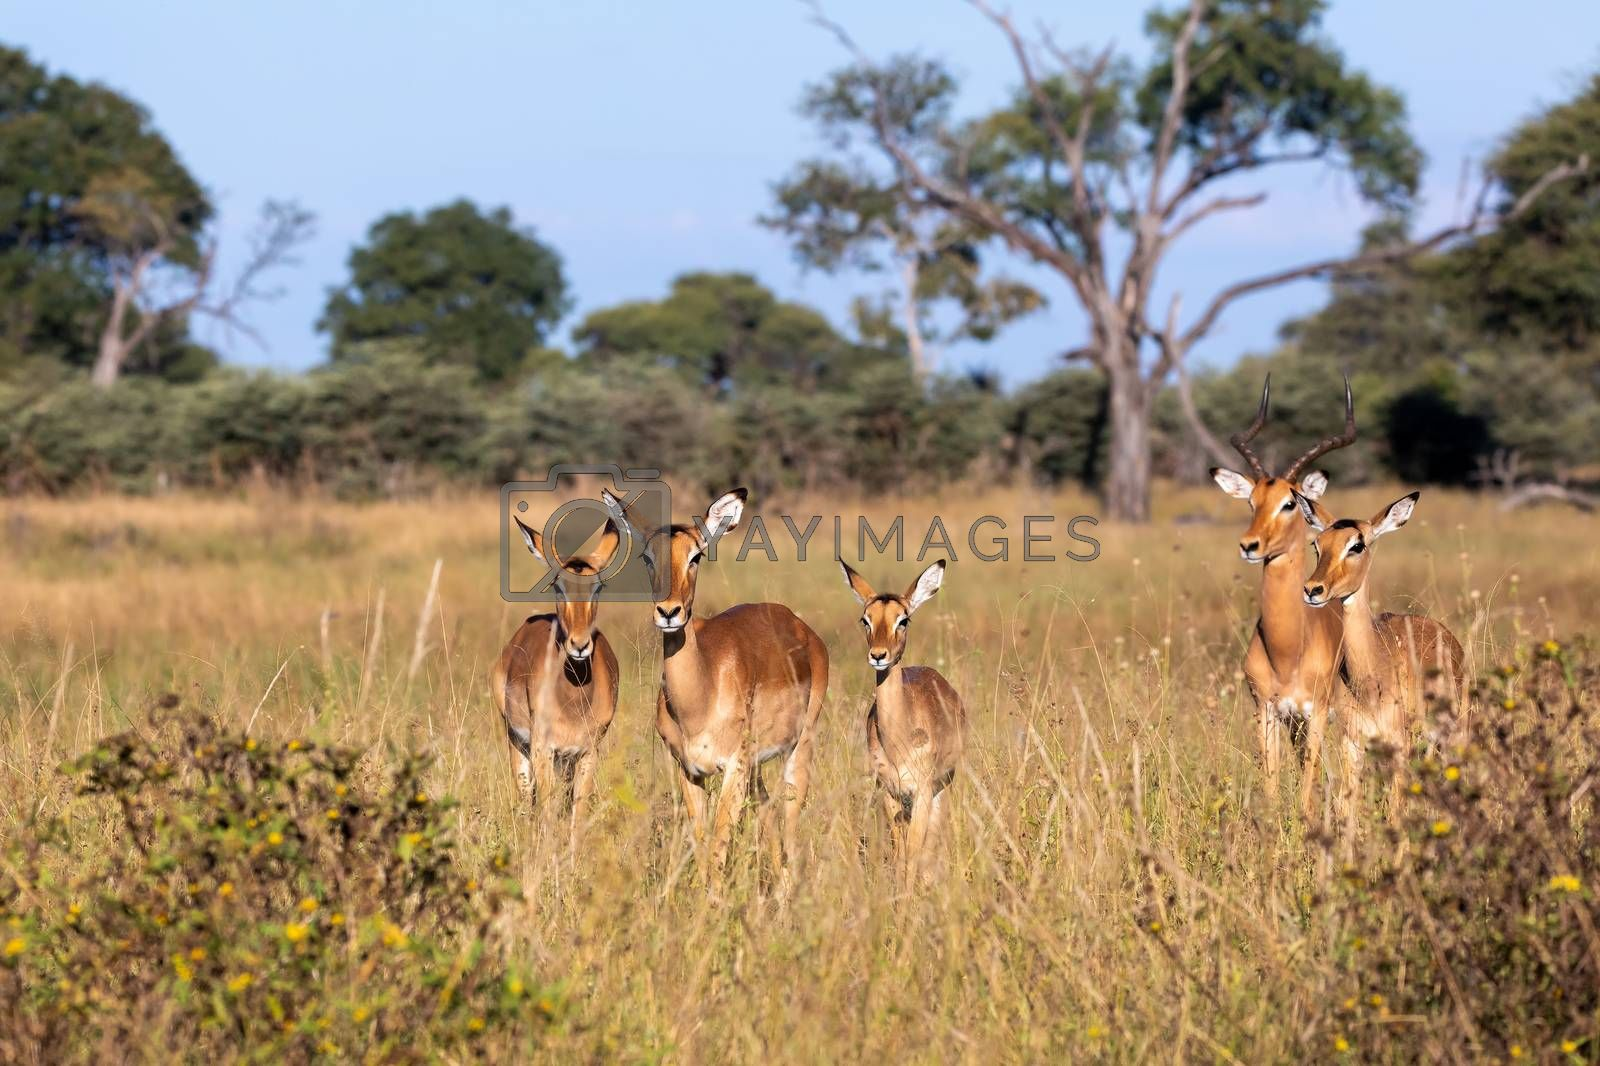 Impala antelope family (Aepyceros melampus) Caprivi strip game park, Nambwa Namibia, Africa safari wildlife and wilderness